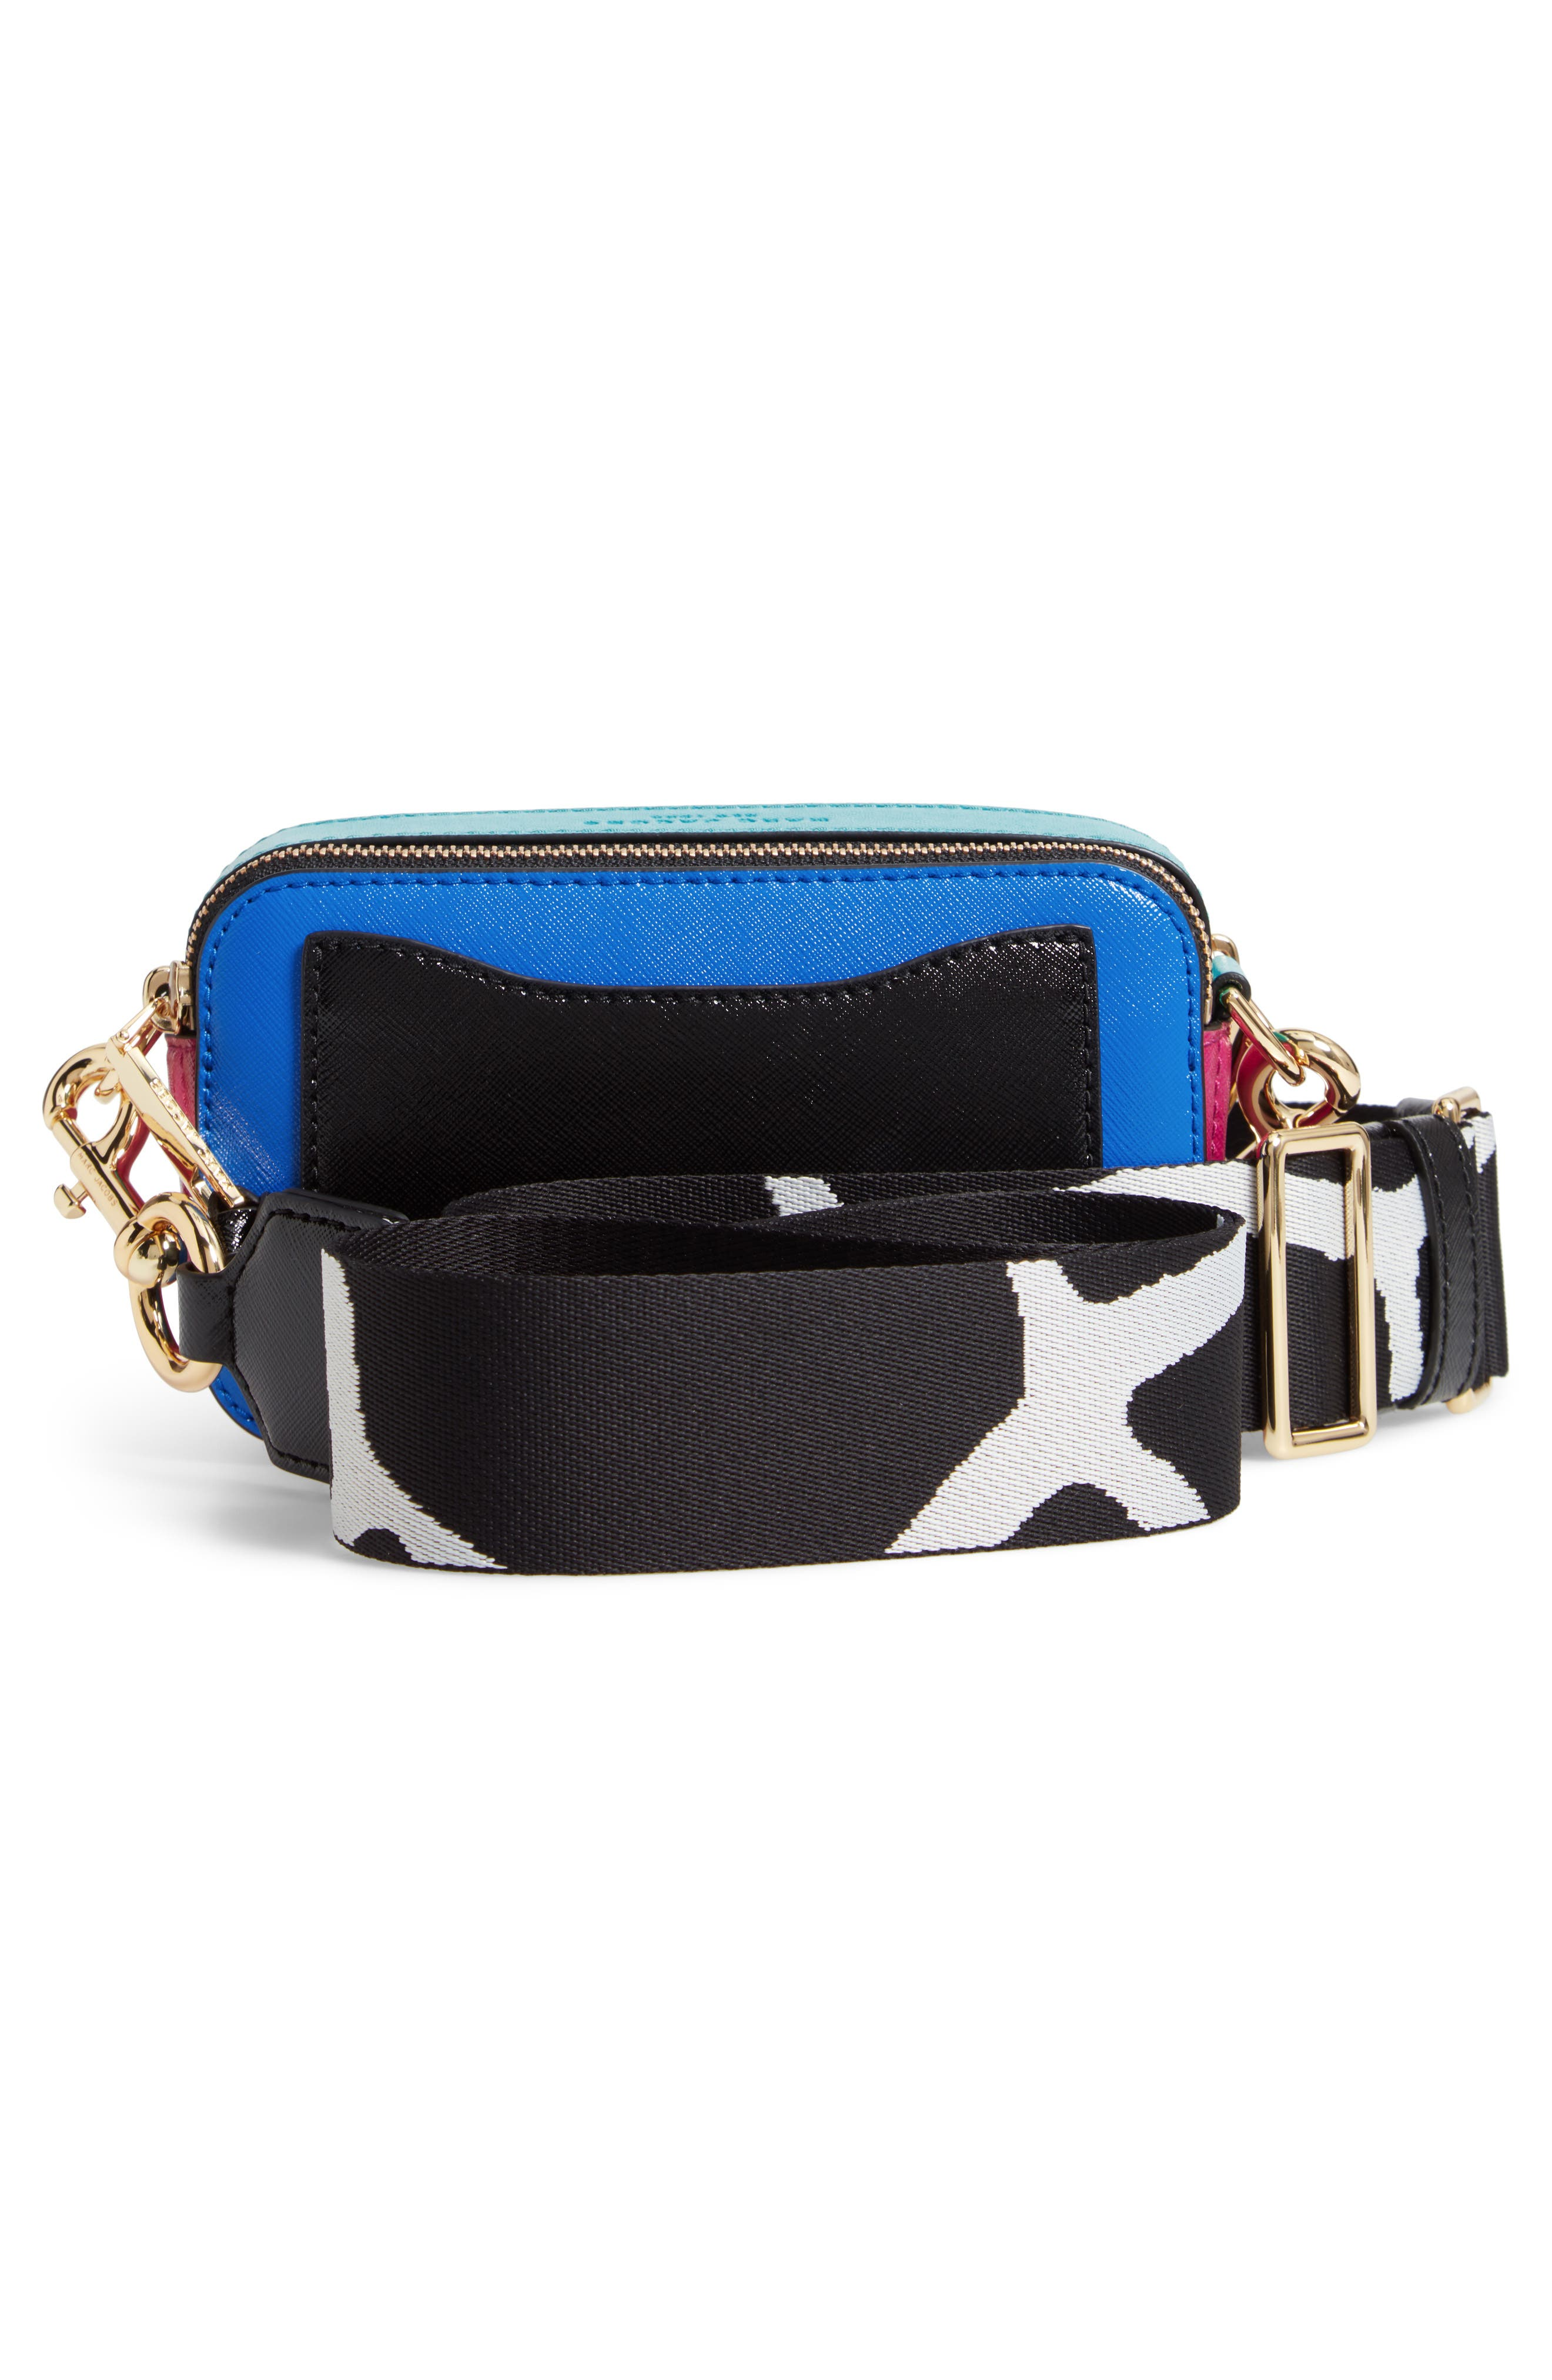 Snapshot Crossbody Bag,                             Alternate thumbnail 3, color,                             Academy Blue Multi